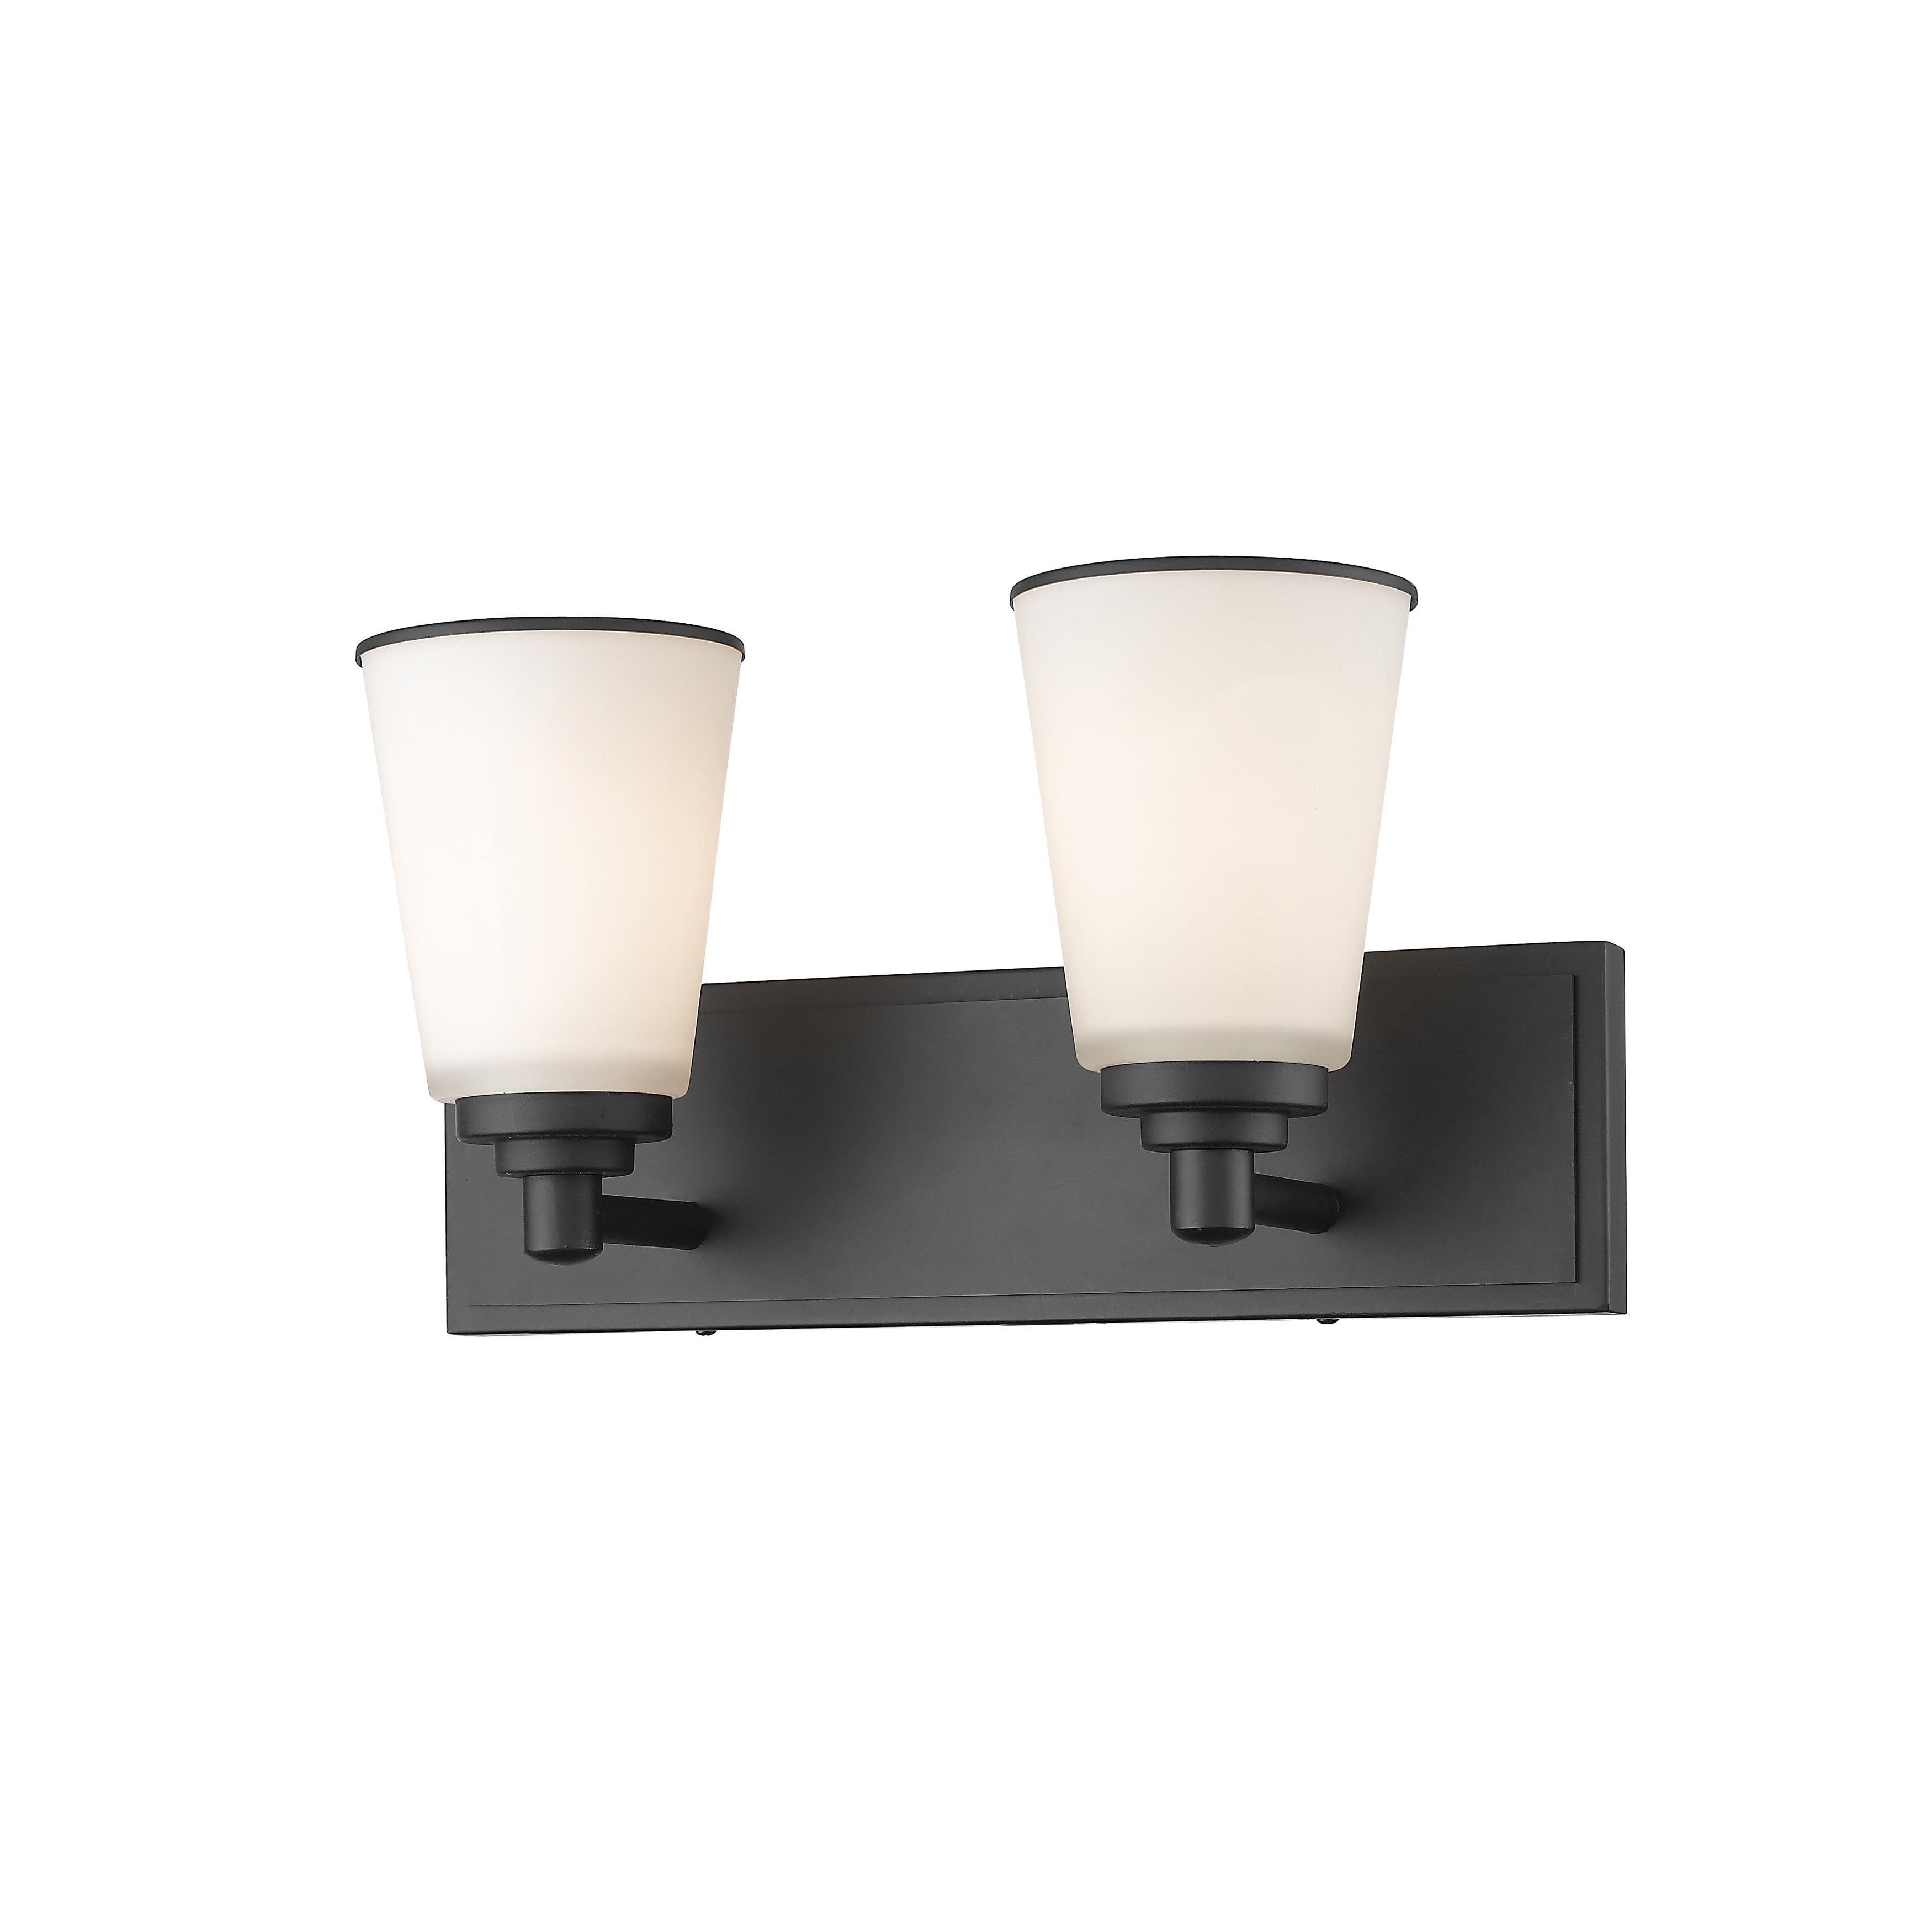 Shop avery home lighting jarra 2 lights bronze vanity on sale free shipping today overstock 10600578